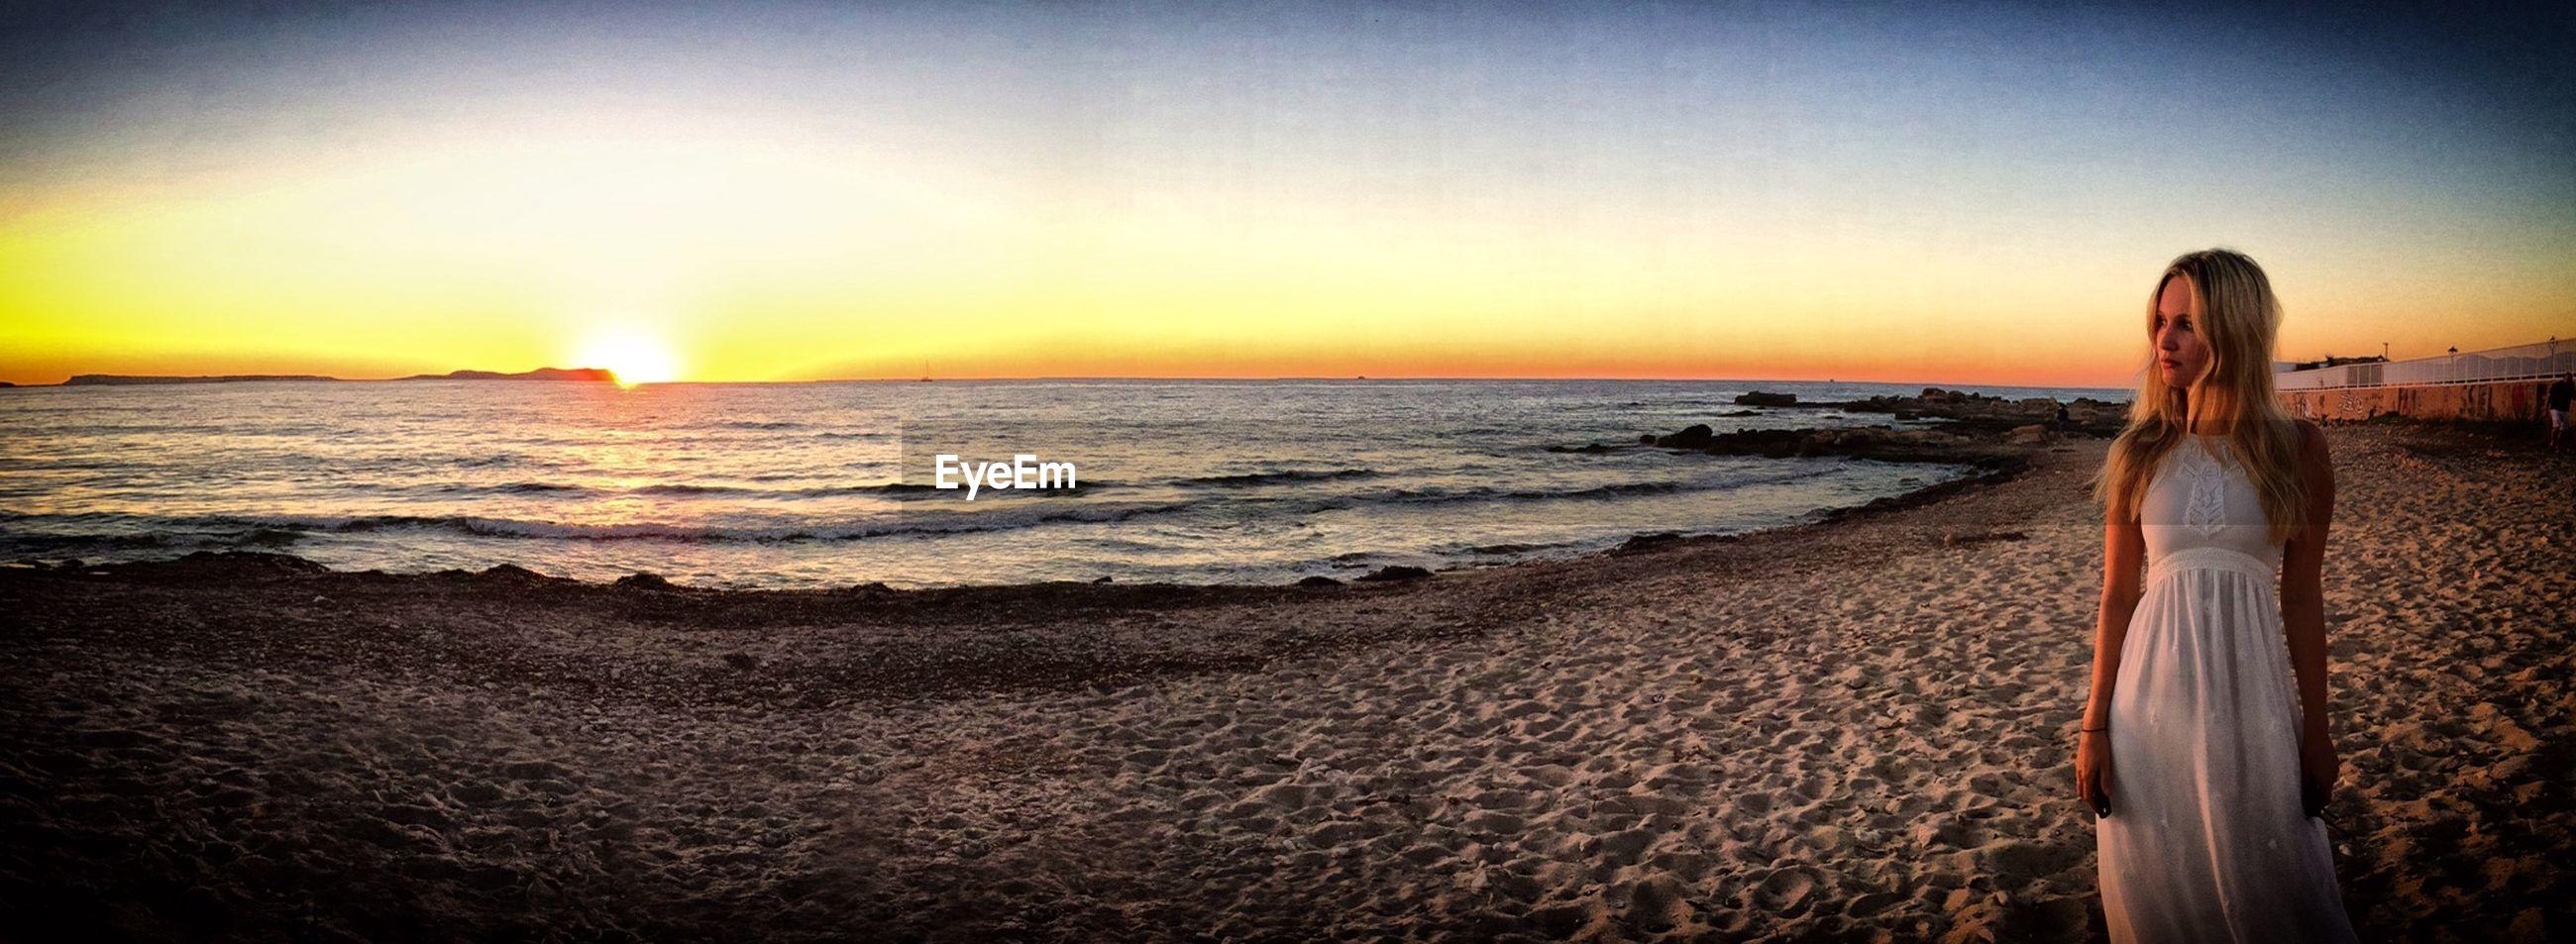 sea, horizon over water, beach, sunset, water, scenics, shore, beauty in nature, orange color, tranquil scene, tranquility, sun, sand, wave, idyllic, nature, sky, clear sky, coastline, sunlight